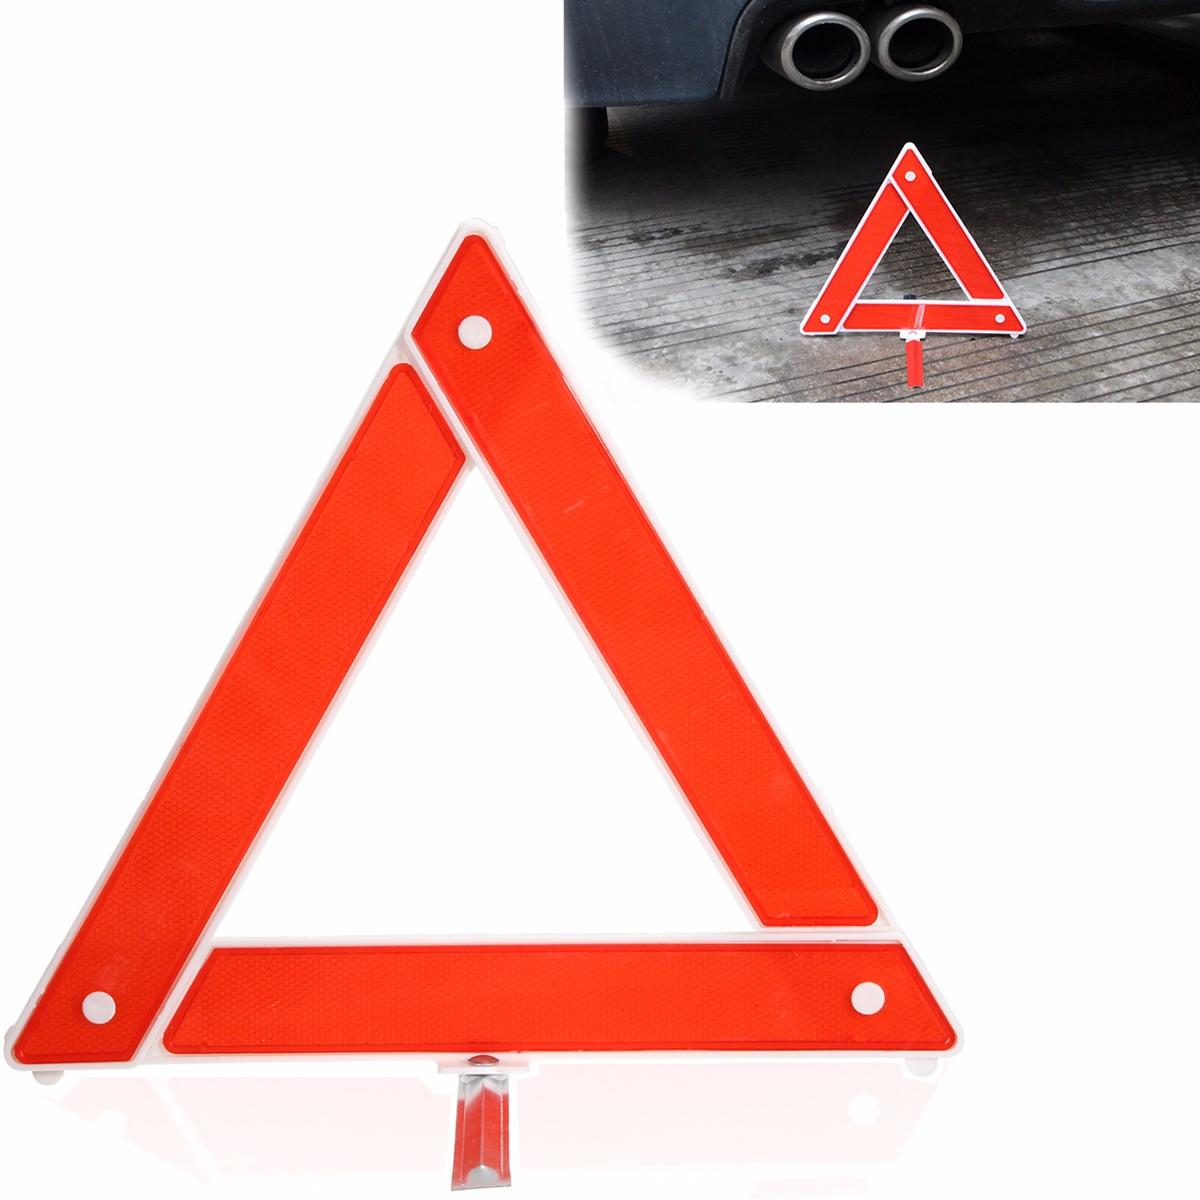 Car Emergency Breakdown Warning Triangle Red Reflective Safety Hazard Travel Kit(China (Mainland))